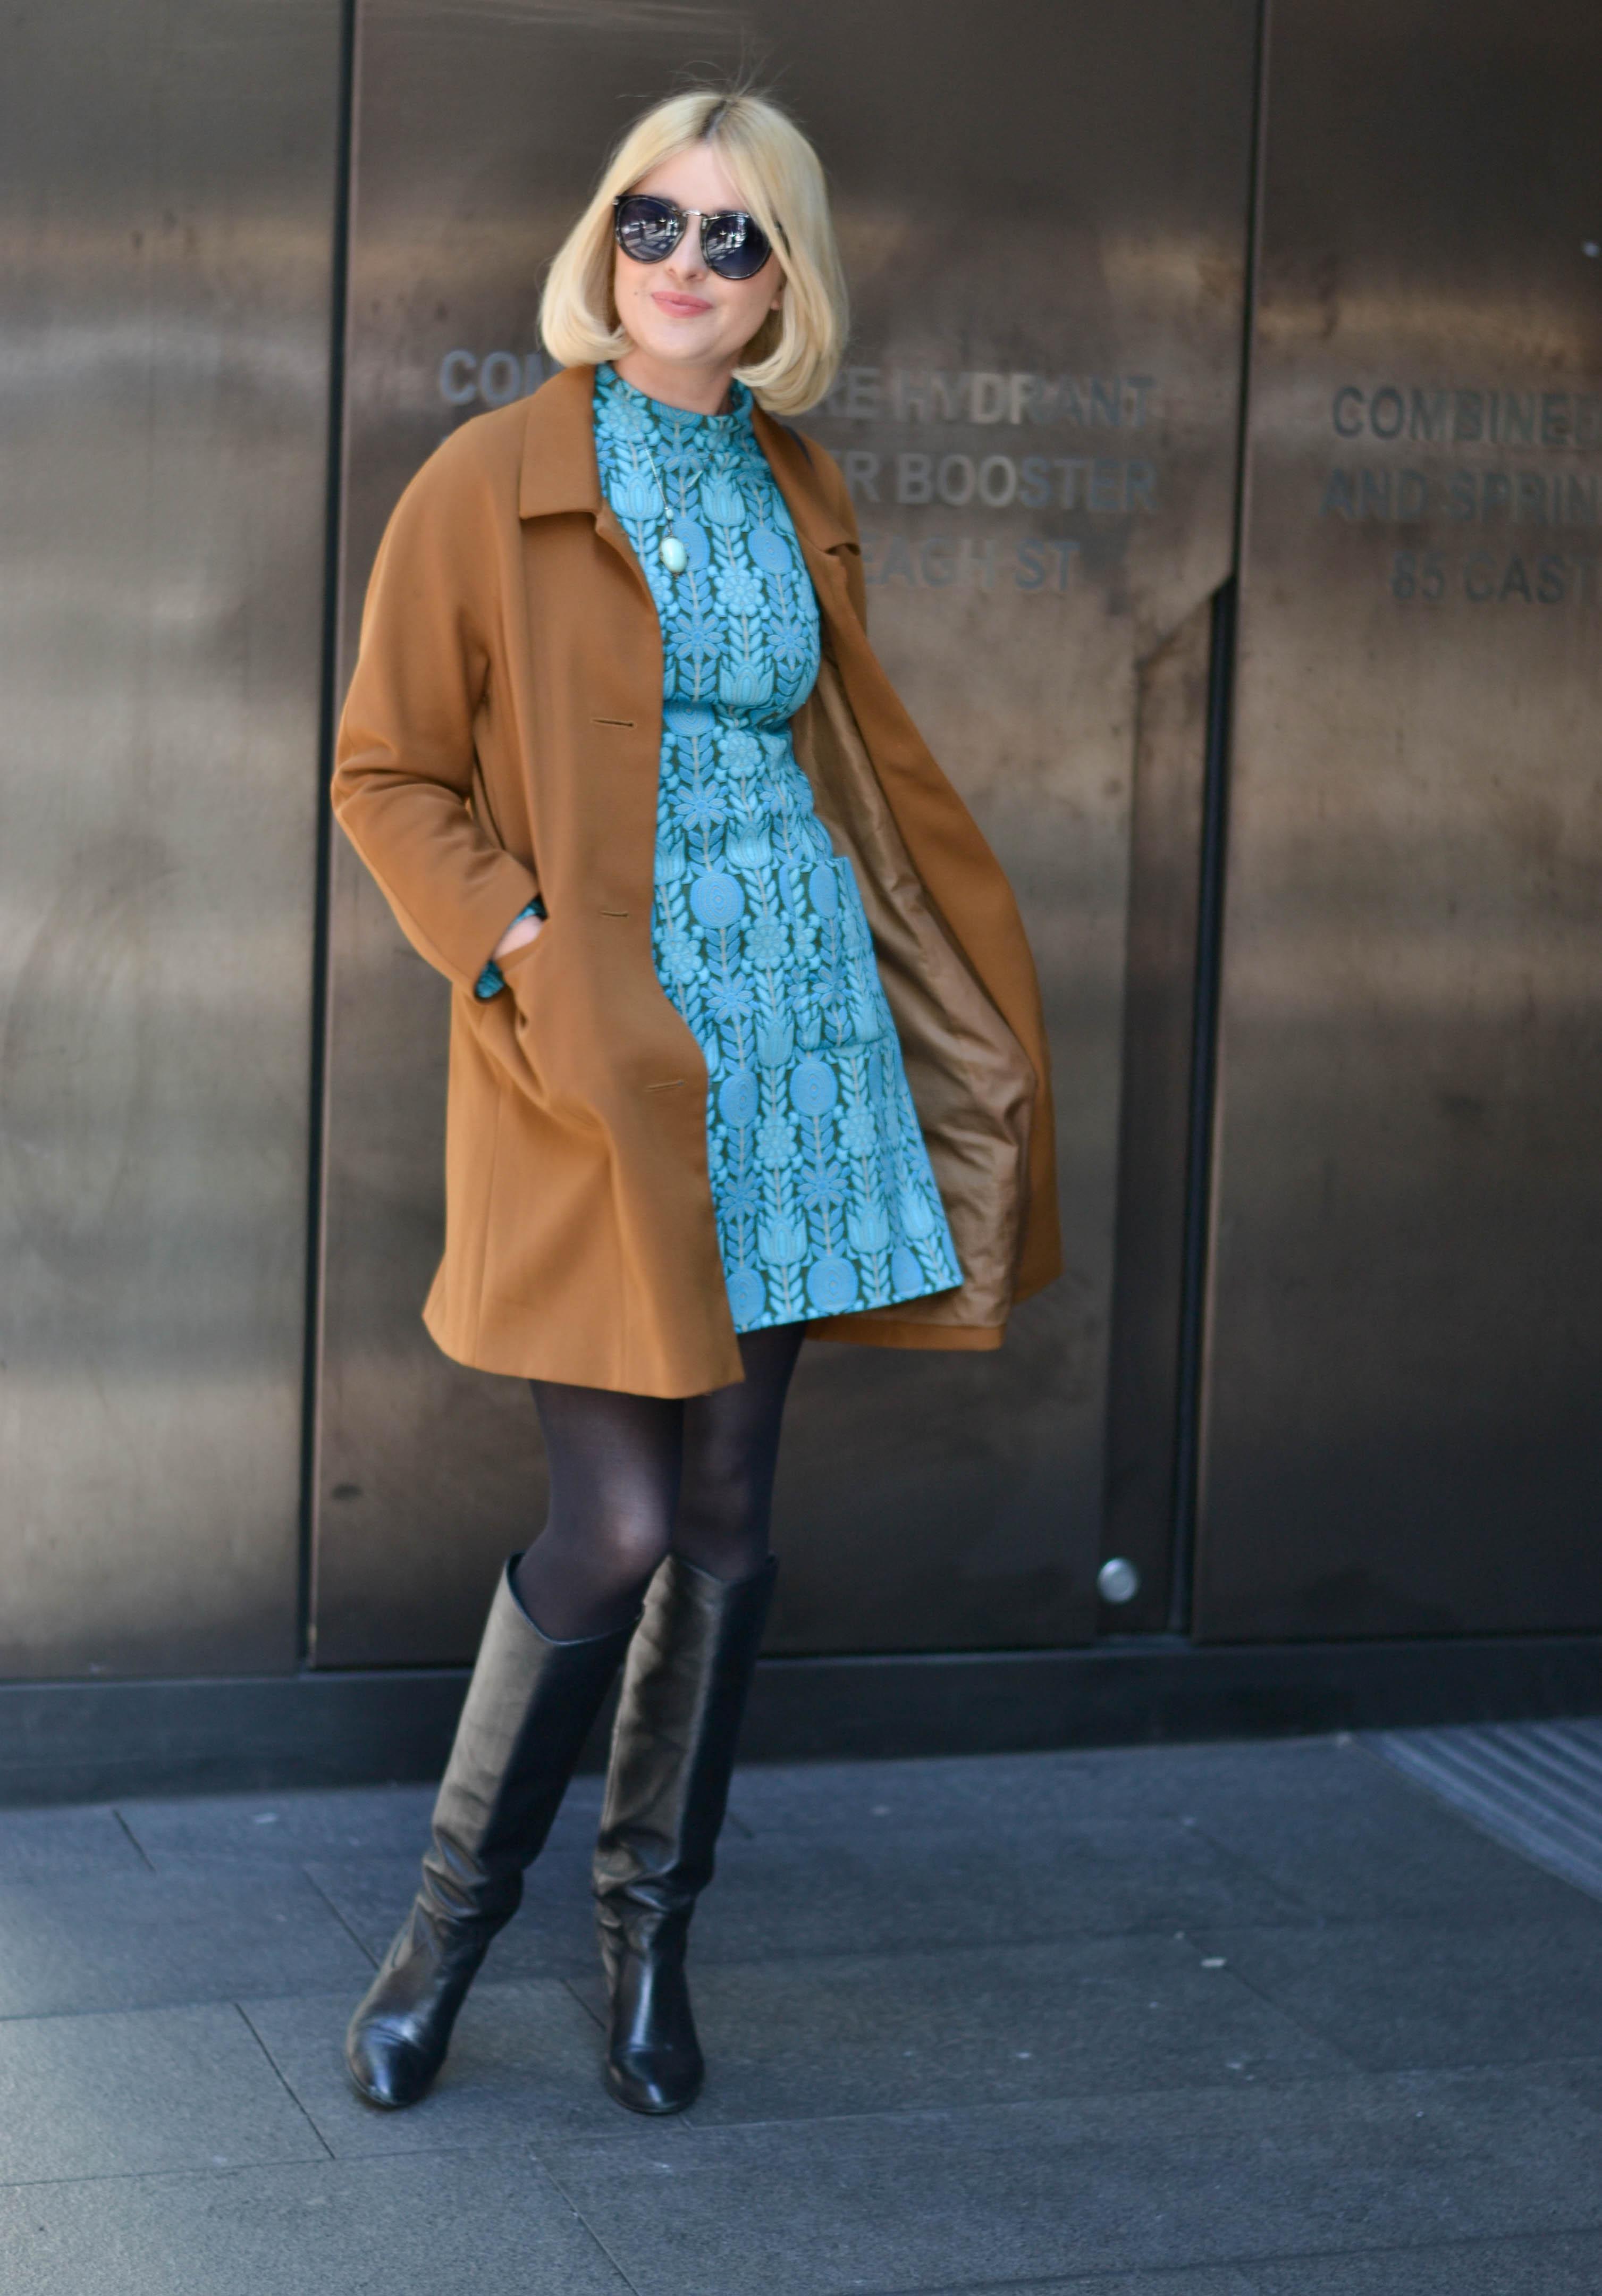 NSW: Annette Ogilvie, stylist and  artist, Castlereagh St, Sydney. Photo: Alice Scriberras.